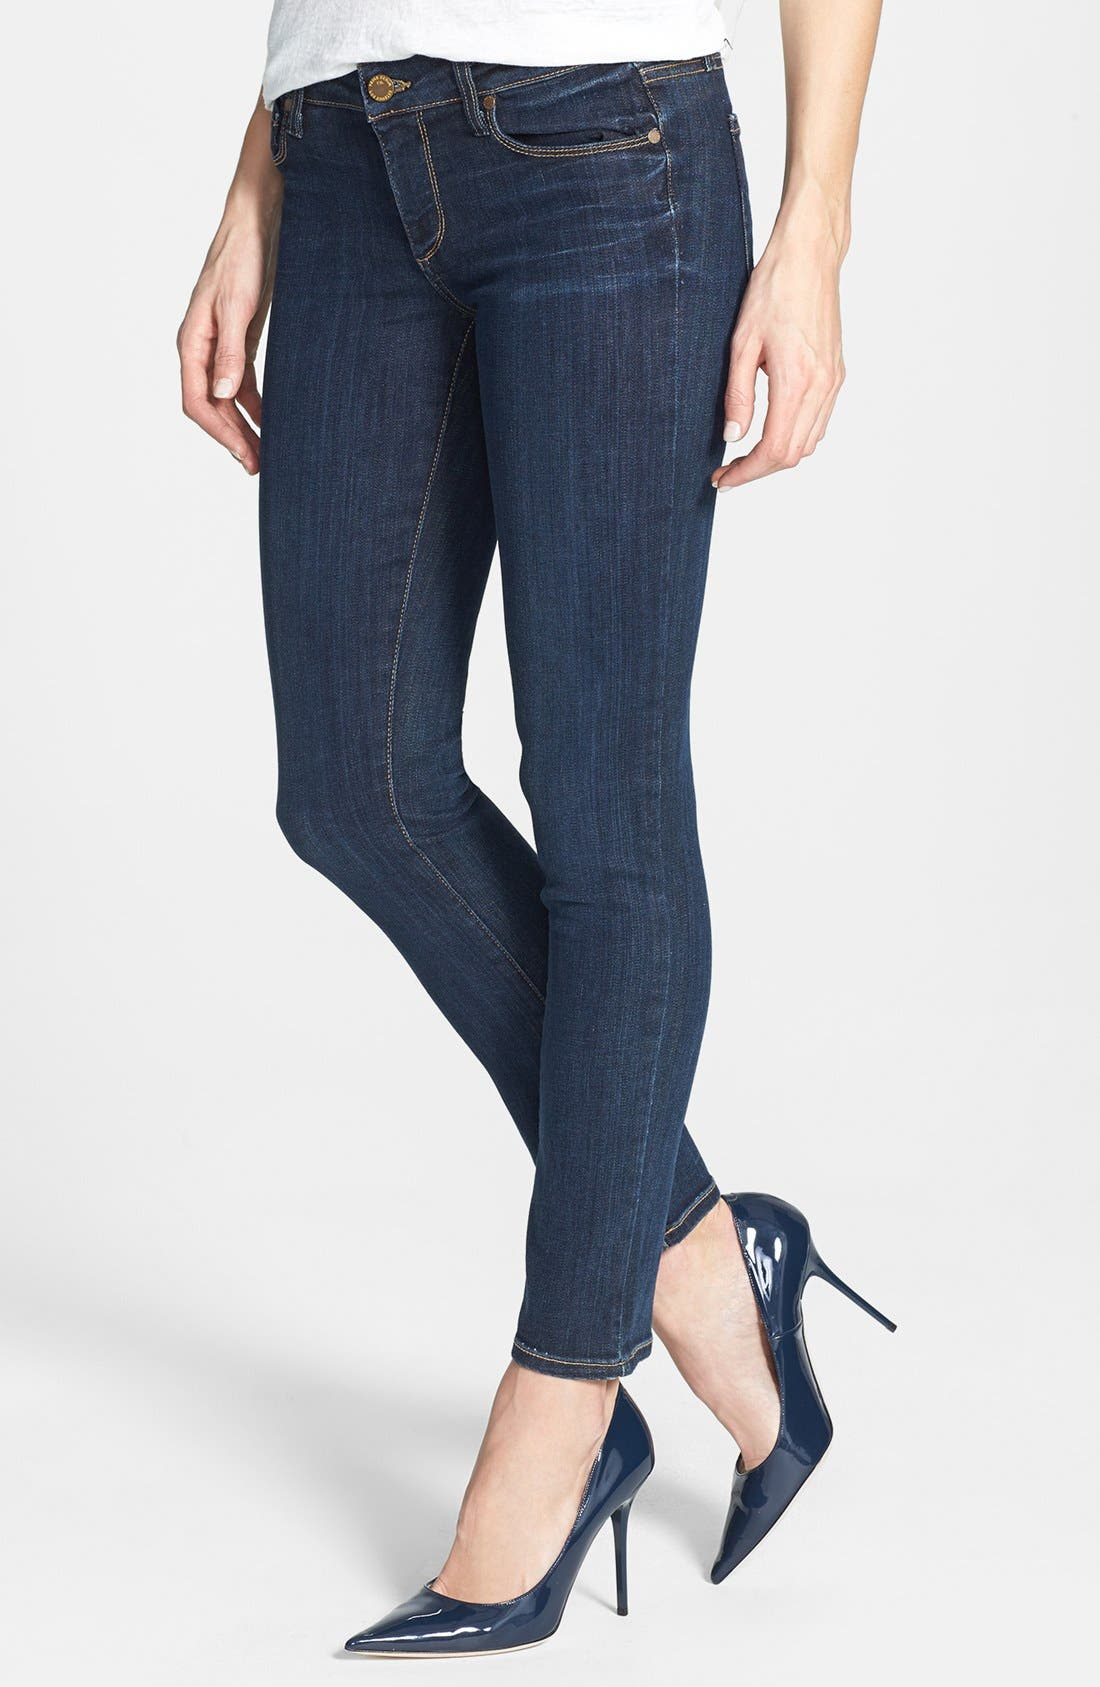 Main Image - Paige Denim 'Skyline' Skinny Ankle Jeans (Delancy)